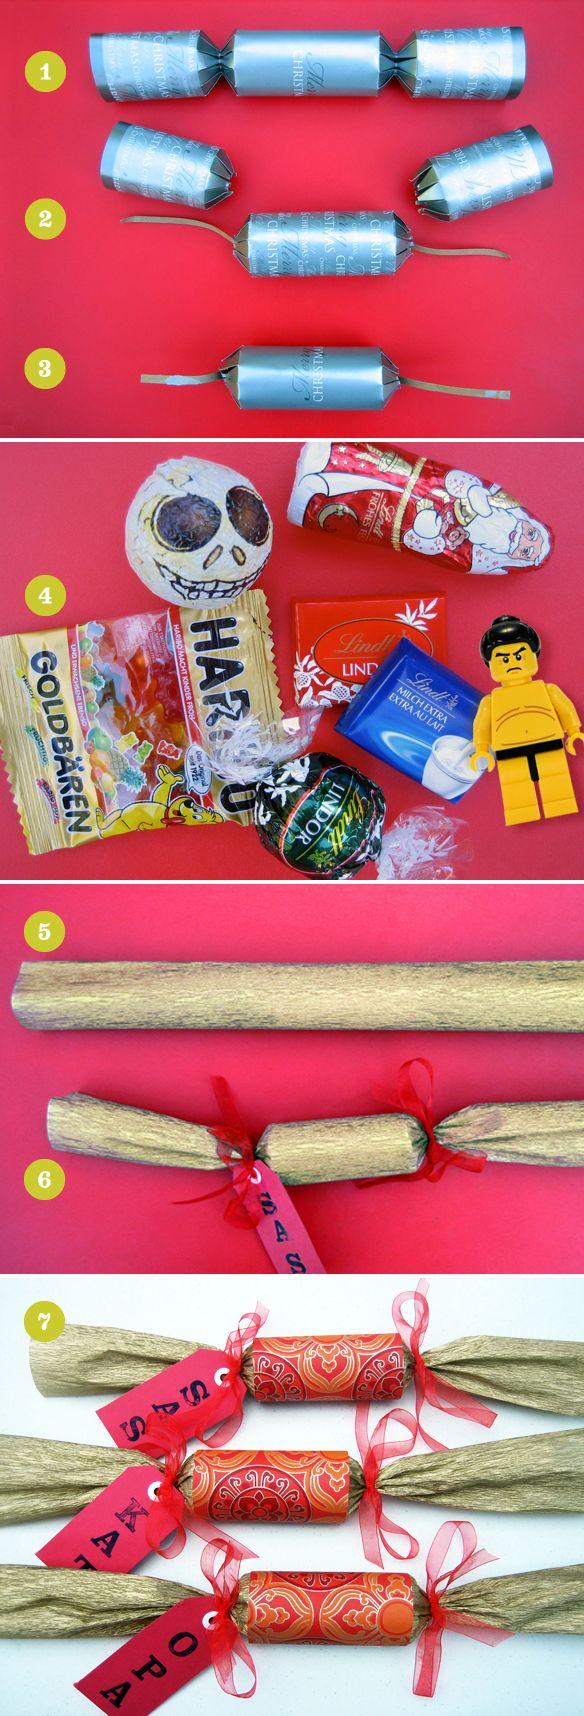 Pimp my cracker!  DIY Christmas crackers tutorial, using re-purposed inexpensive store-bought crackers.